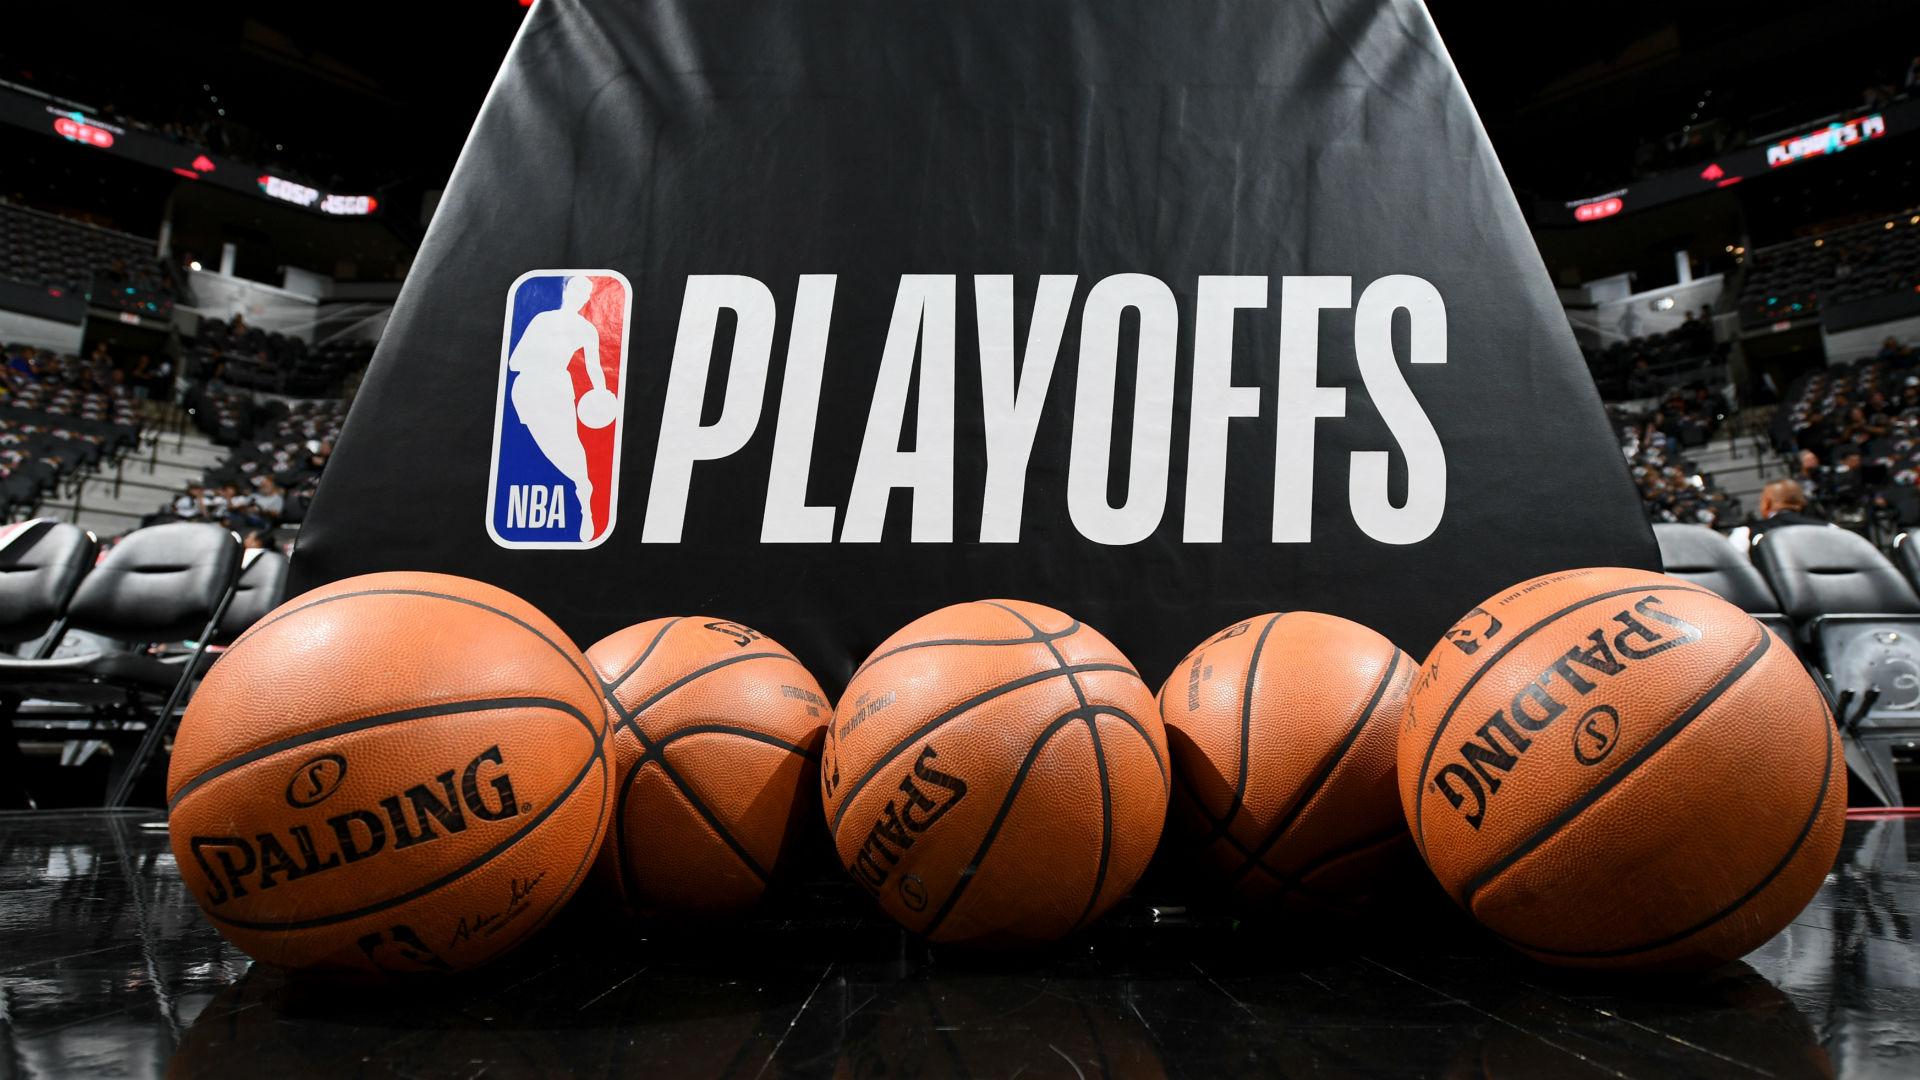 Nba Calendrier Playoff 2021 When do the 2020 NBA Playoffs and Finals begin? | NBA.India